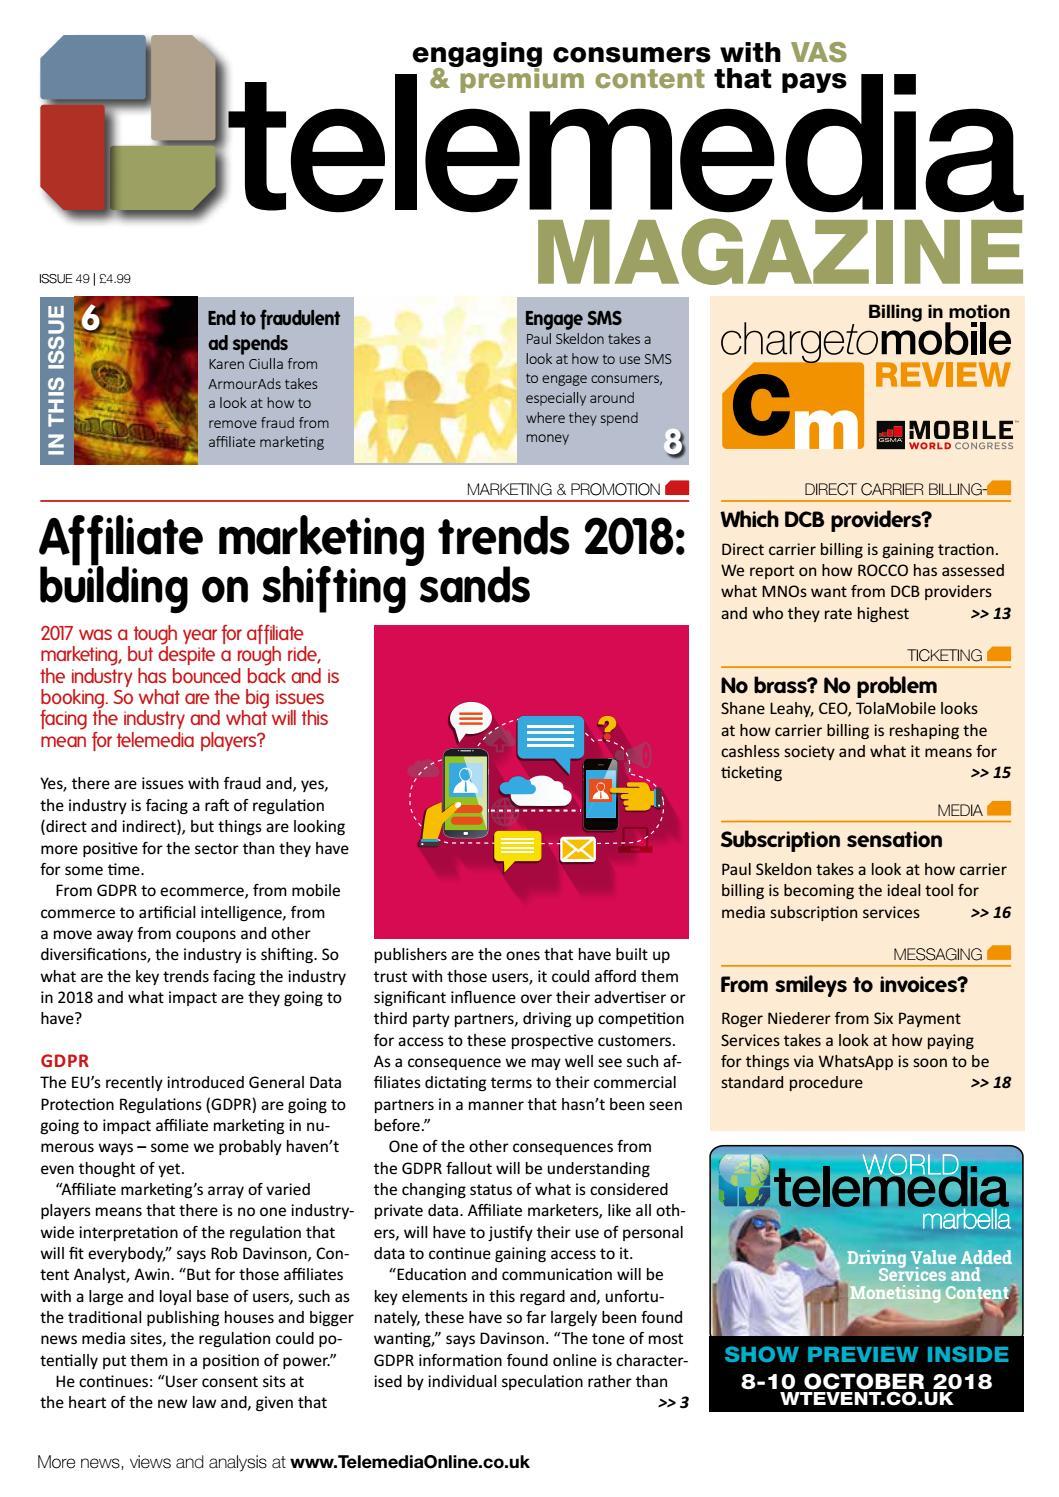 Telemedia Magazine Issue By Annika Micheli Issuu - Invoice maker free download rocco online store